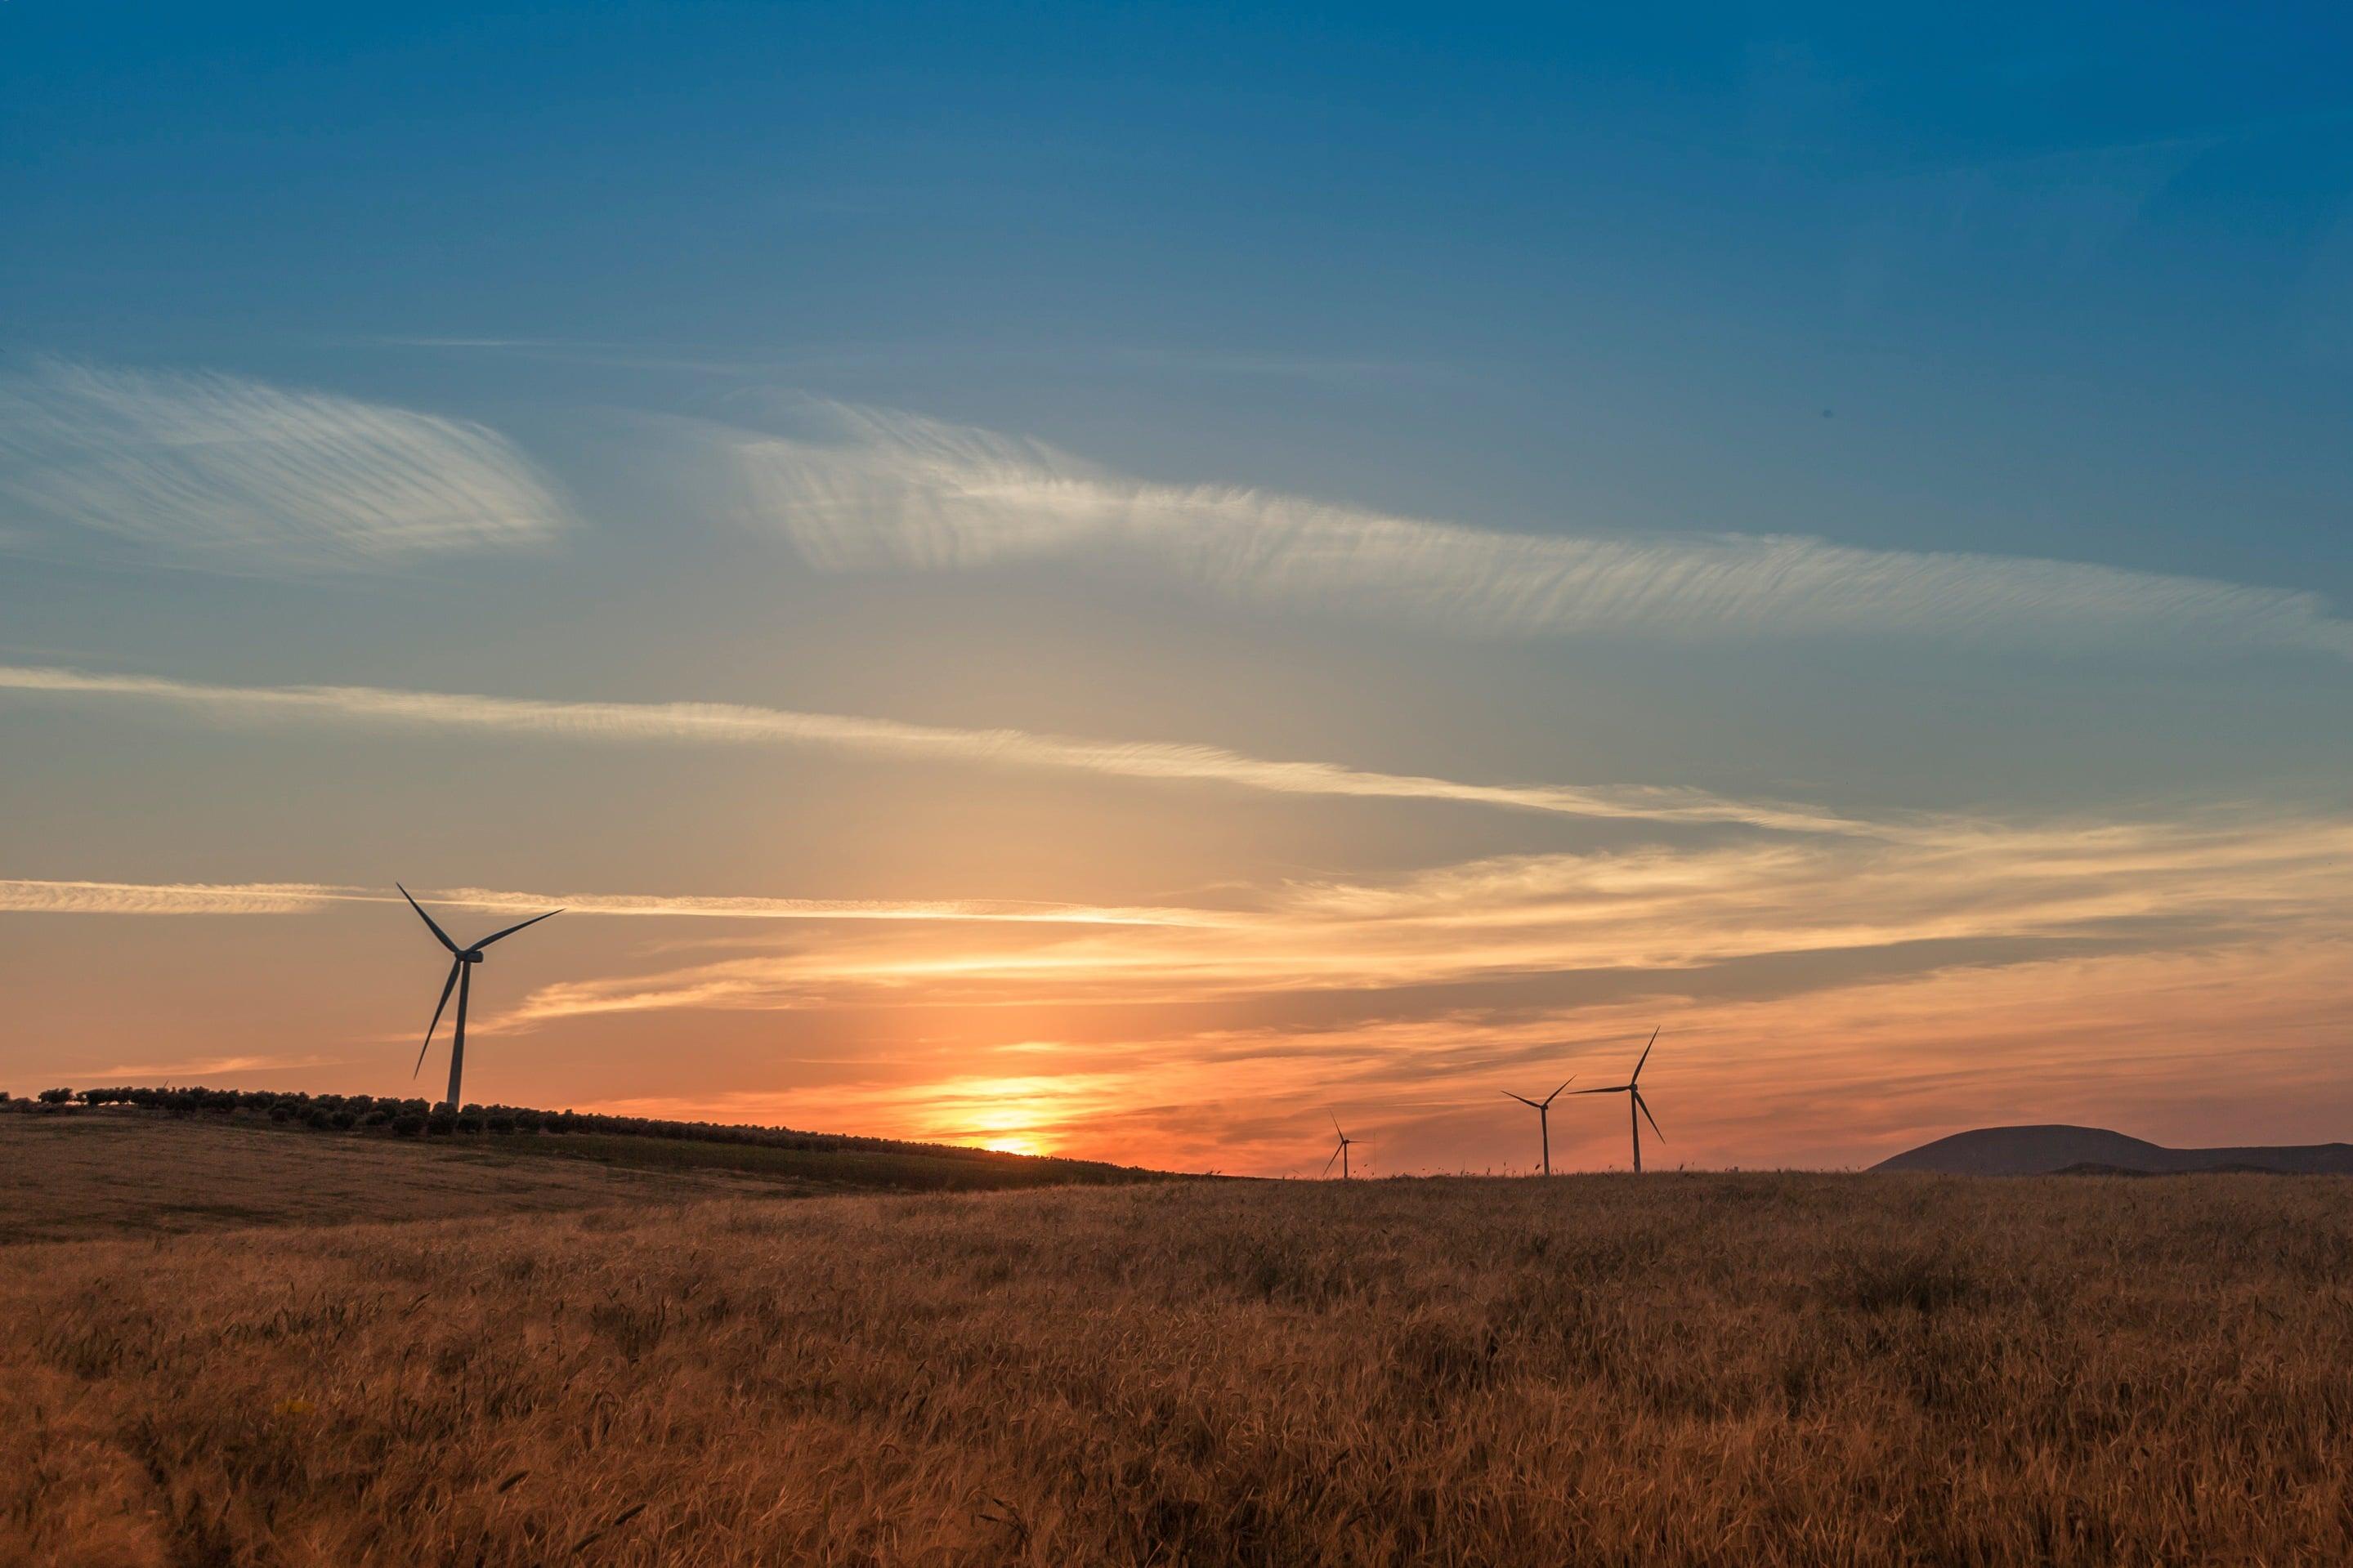 Gamesa-wind-farm Gamesa Wins Debut Order For New G126-2.625 MW Machine